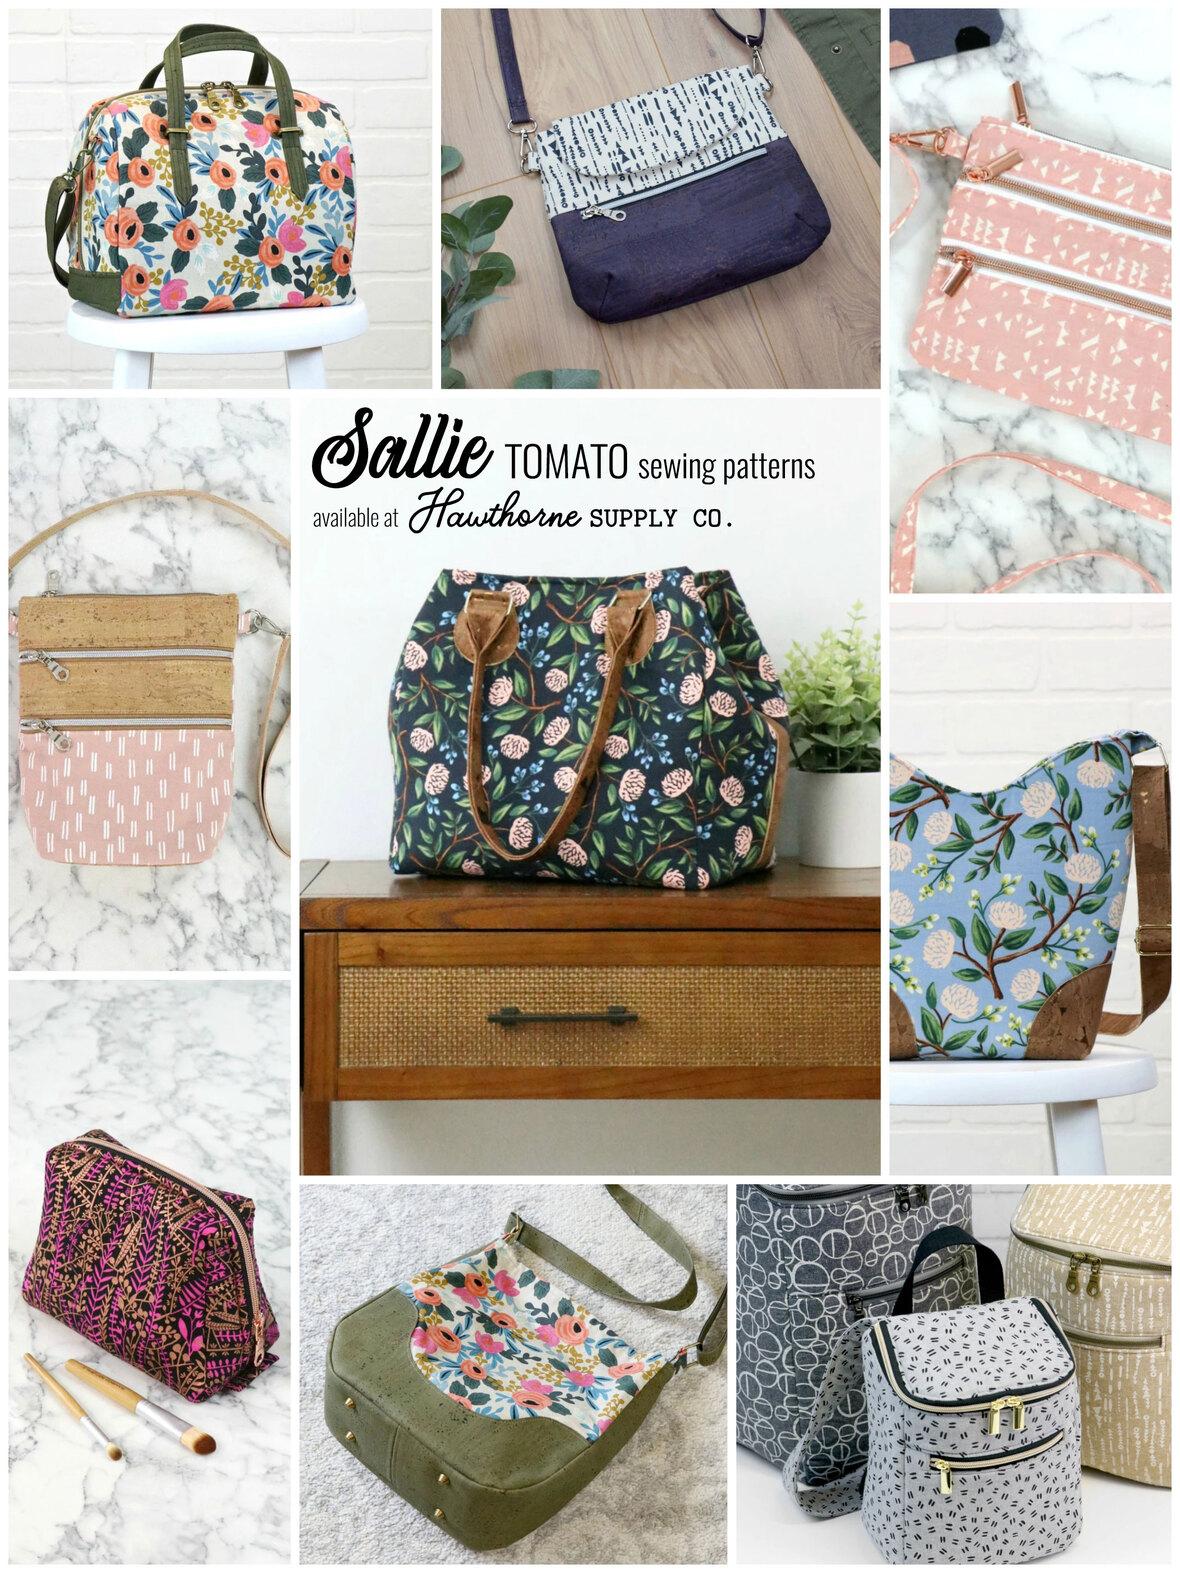 Sallie-Tomato-Bag-Patterns-at-Hawthorne-Supply-Co